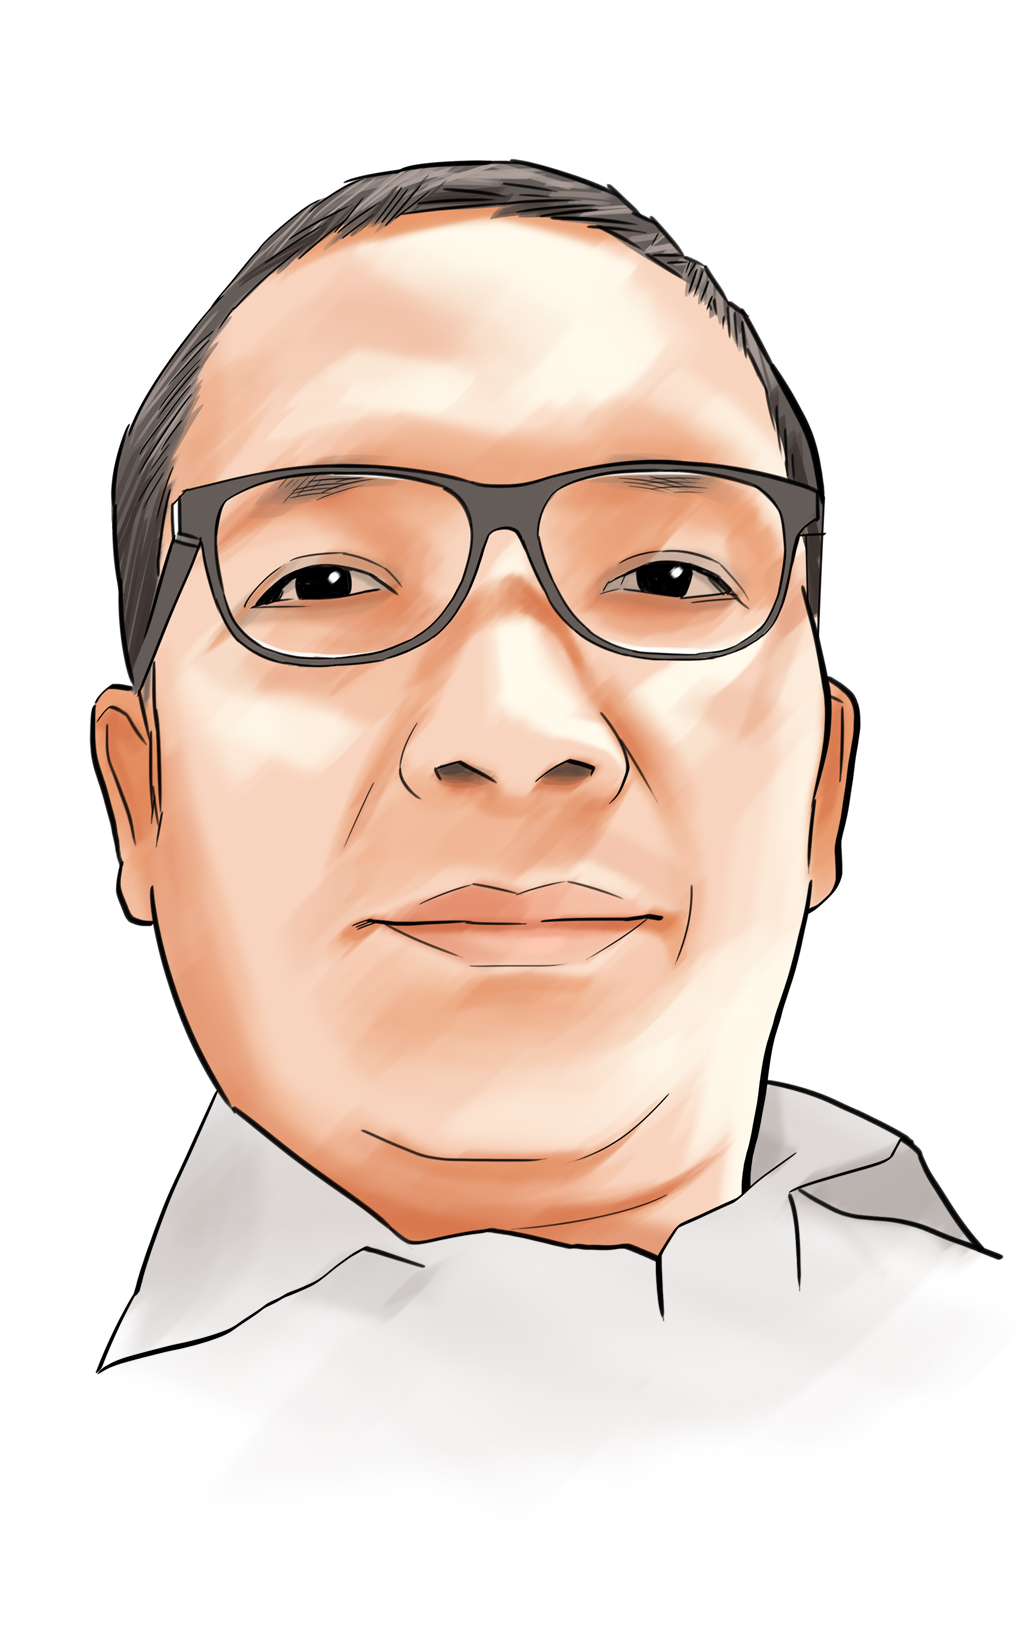 BERANDA : Kurang Kencang, Pak Jokowi...